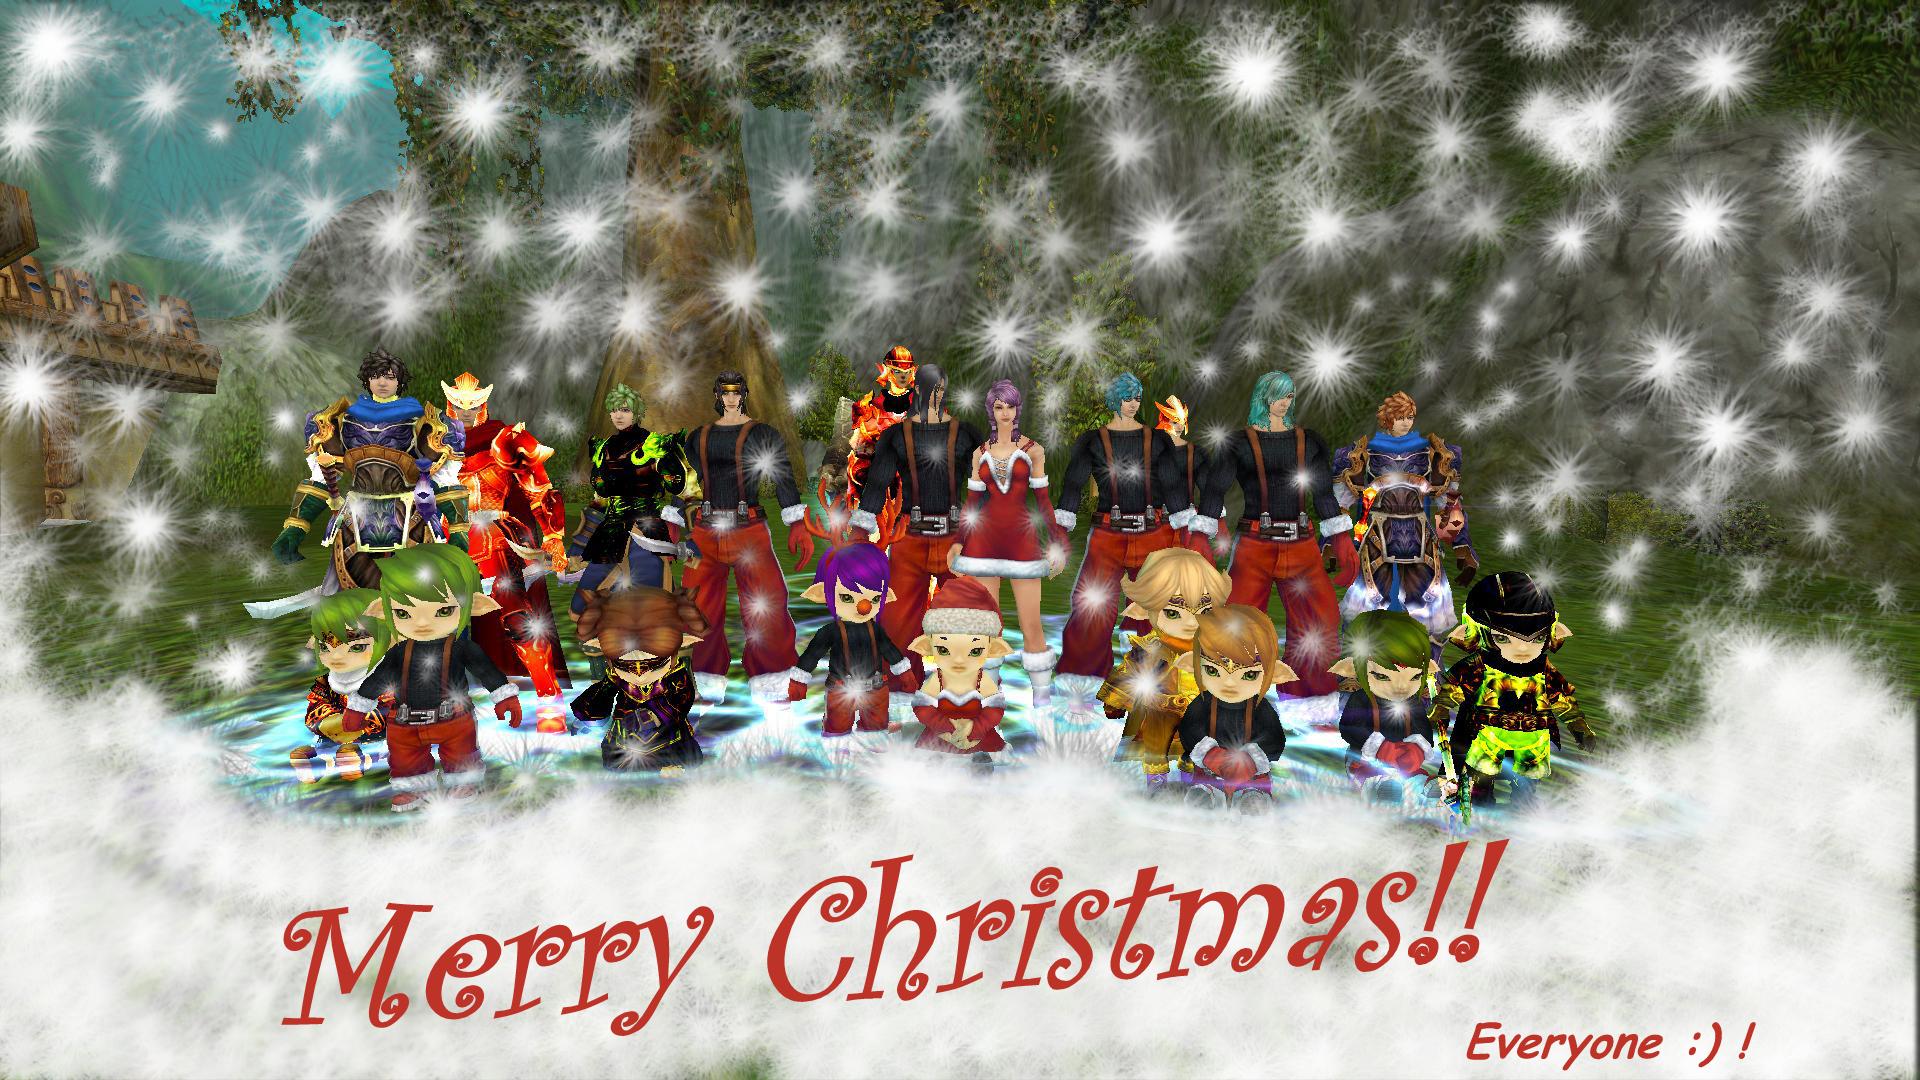 Merry Christmas by xMidziak